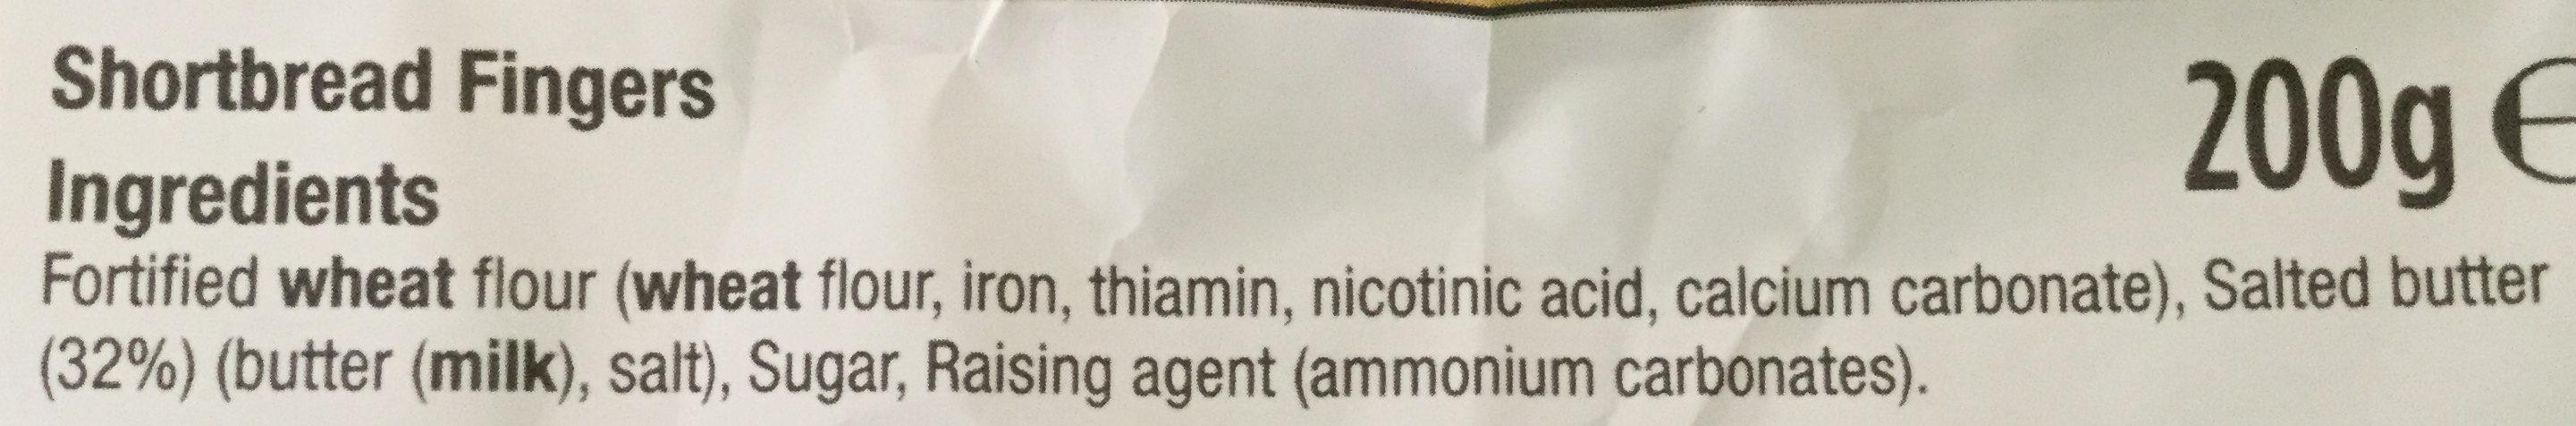 Shortbread - Ingredients